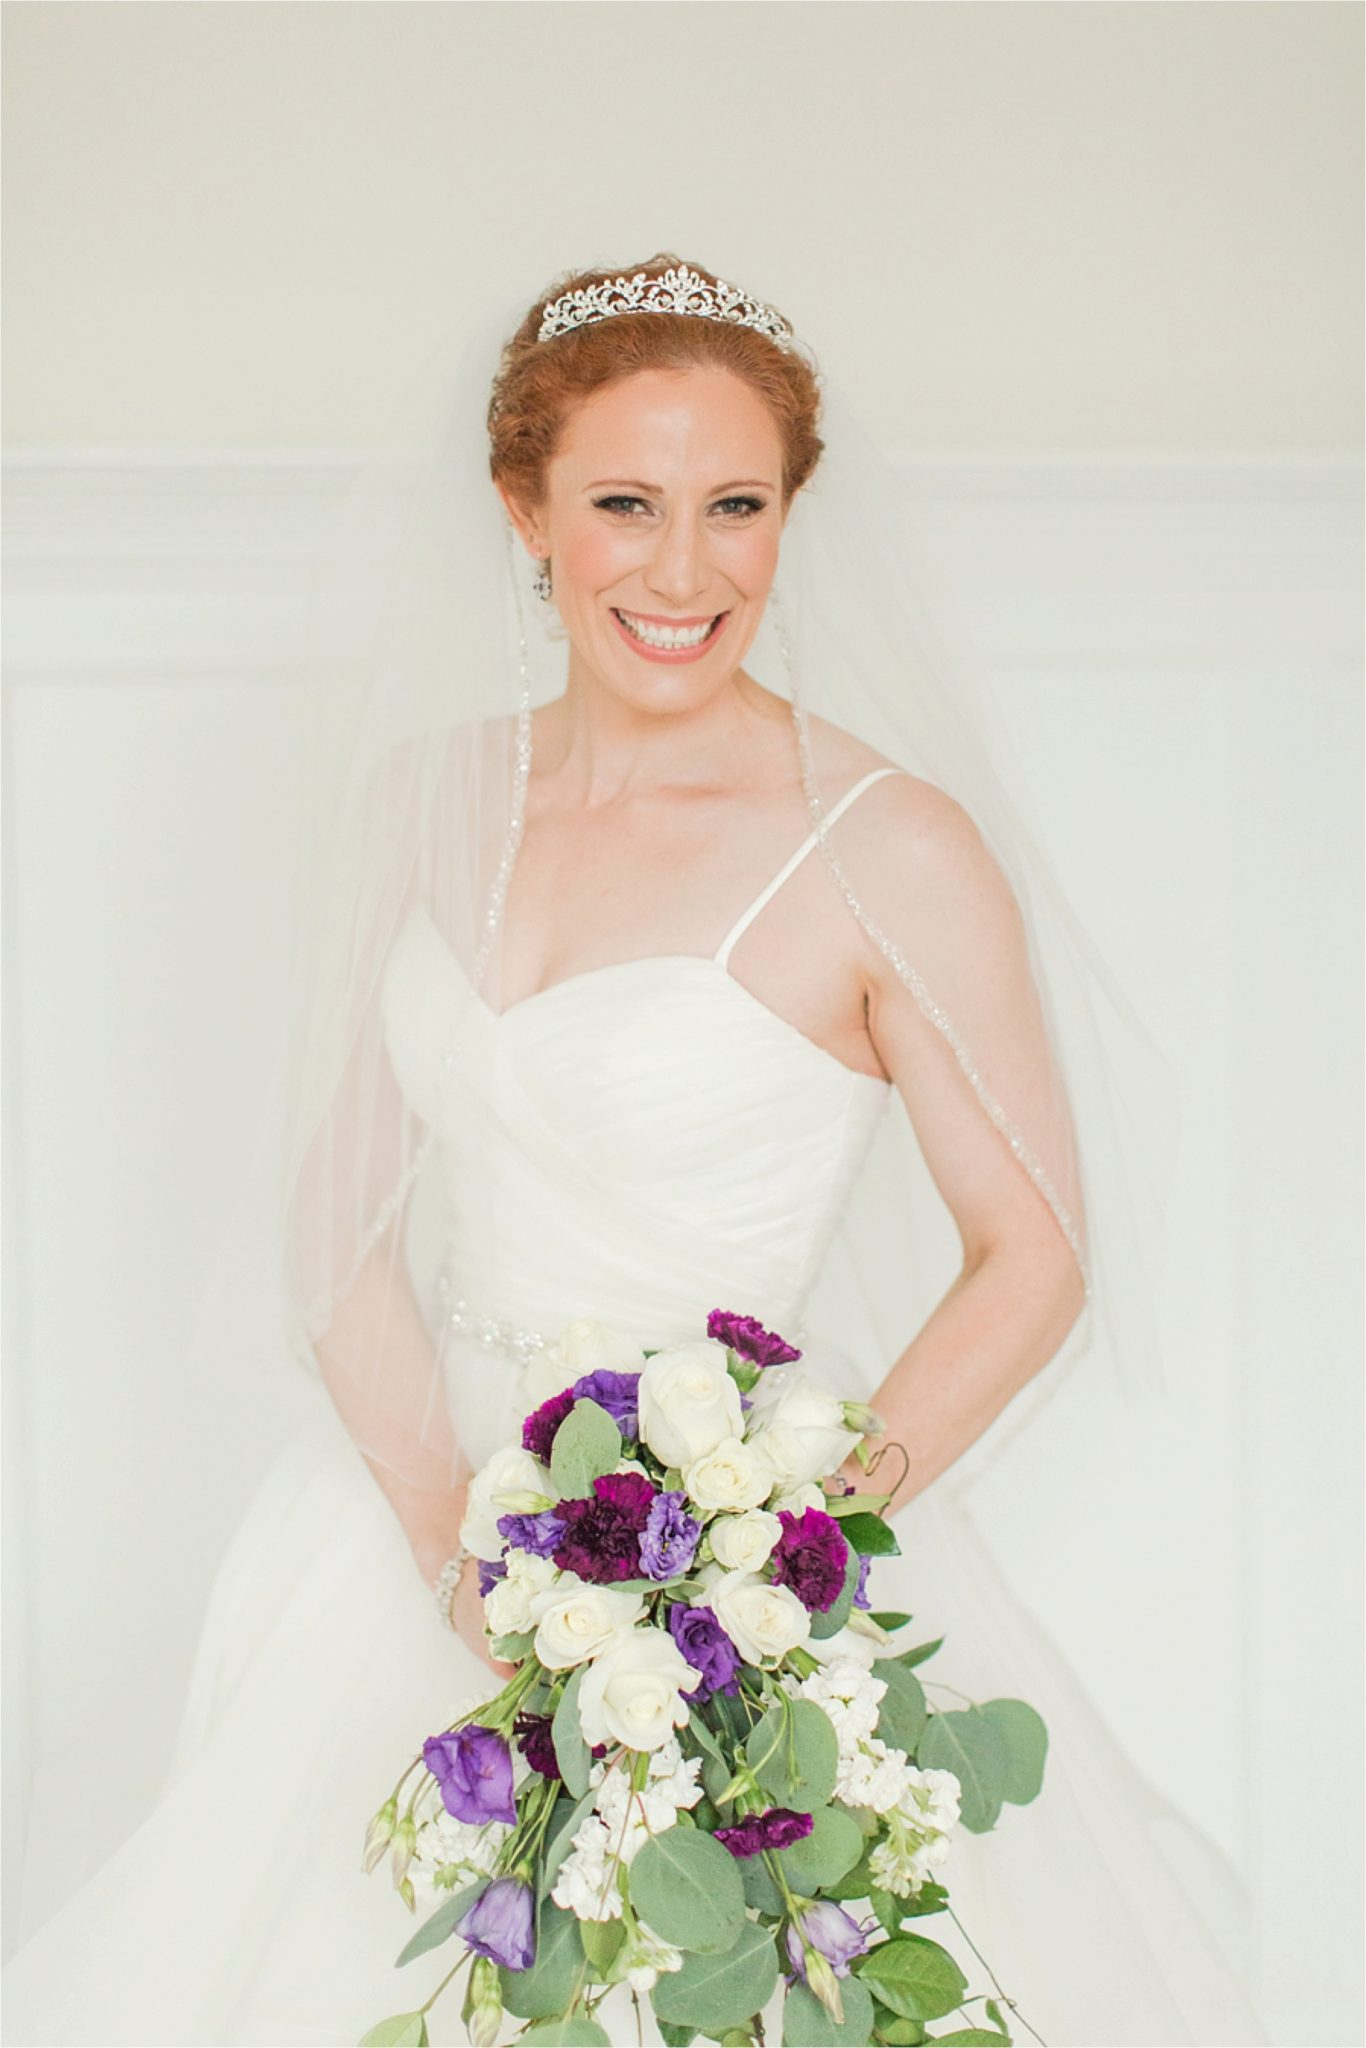 Bridal Session at The Pillars of Mobile-Mobile Alabama Wedding Photographer-Sarra-Bridal session-Wedding dress-Wedding bouquet